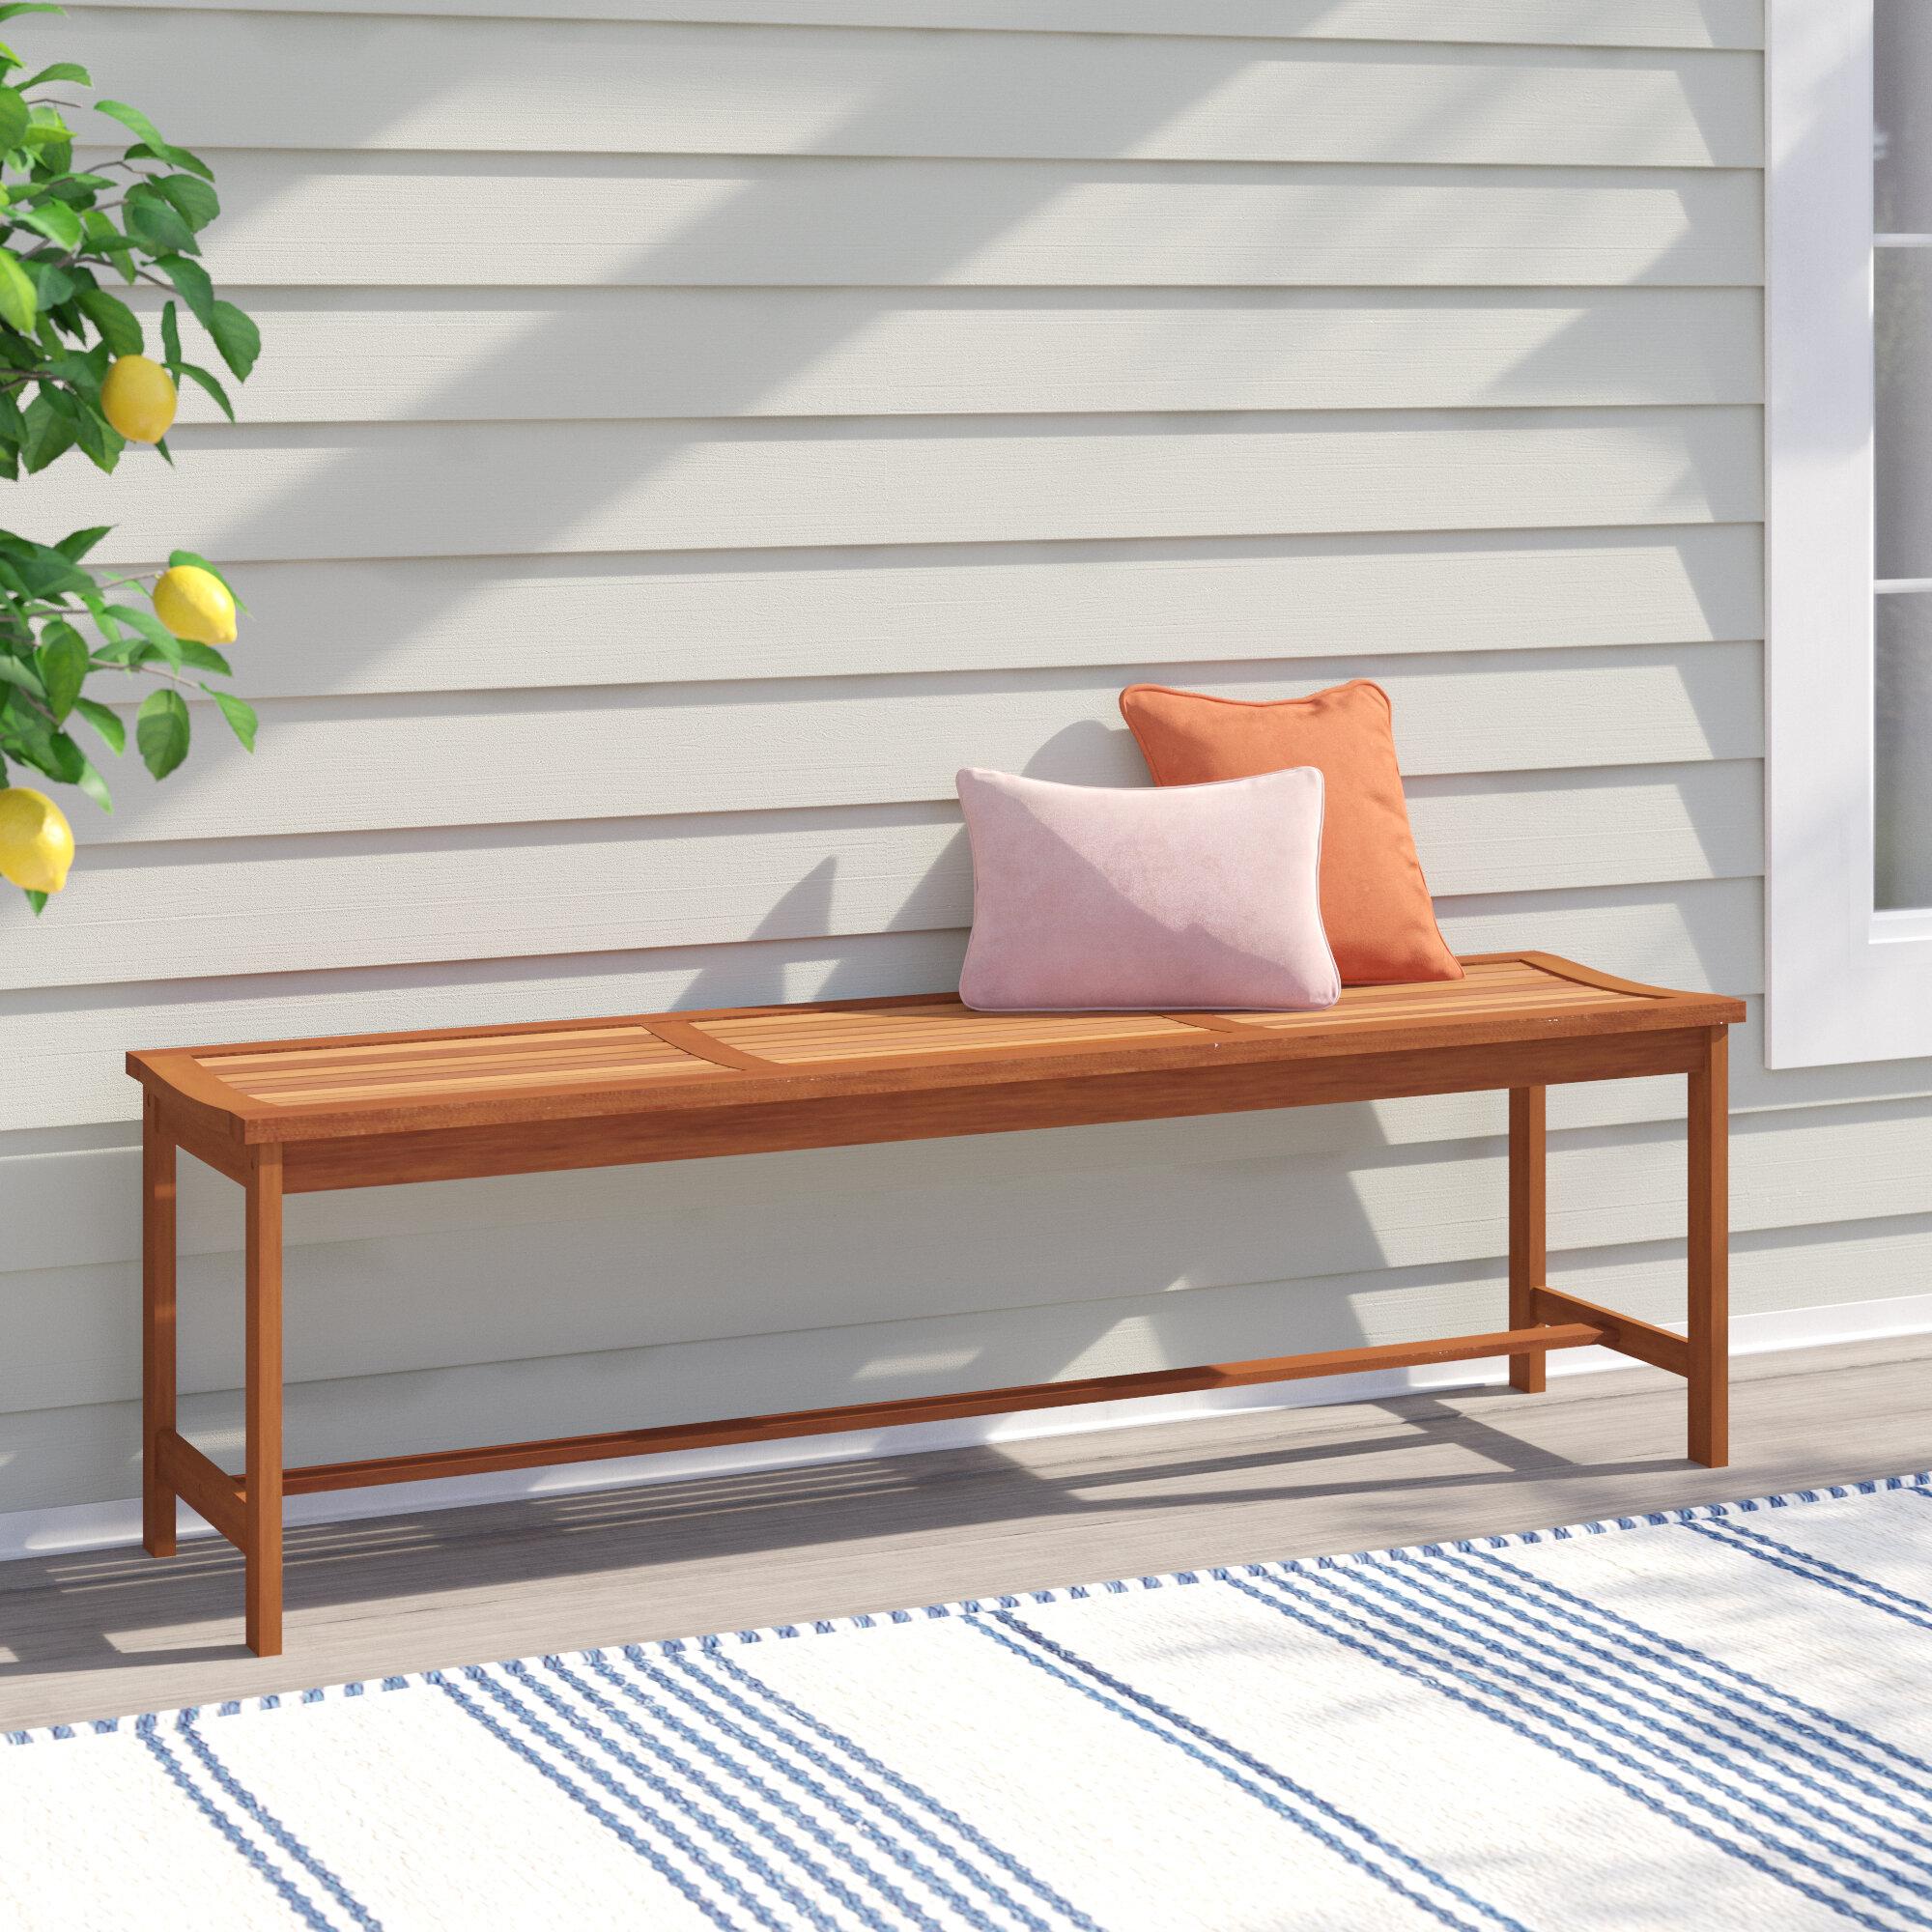 Cadsden Hardwood Picnic Bench With Regard To Cavin Garden Benches (View 18 of 25)